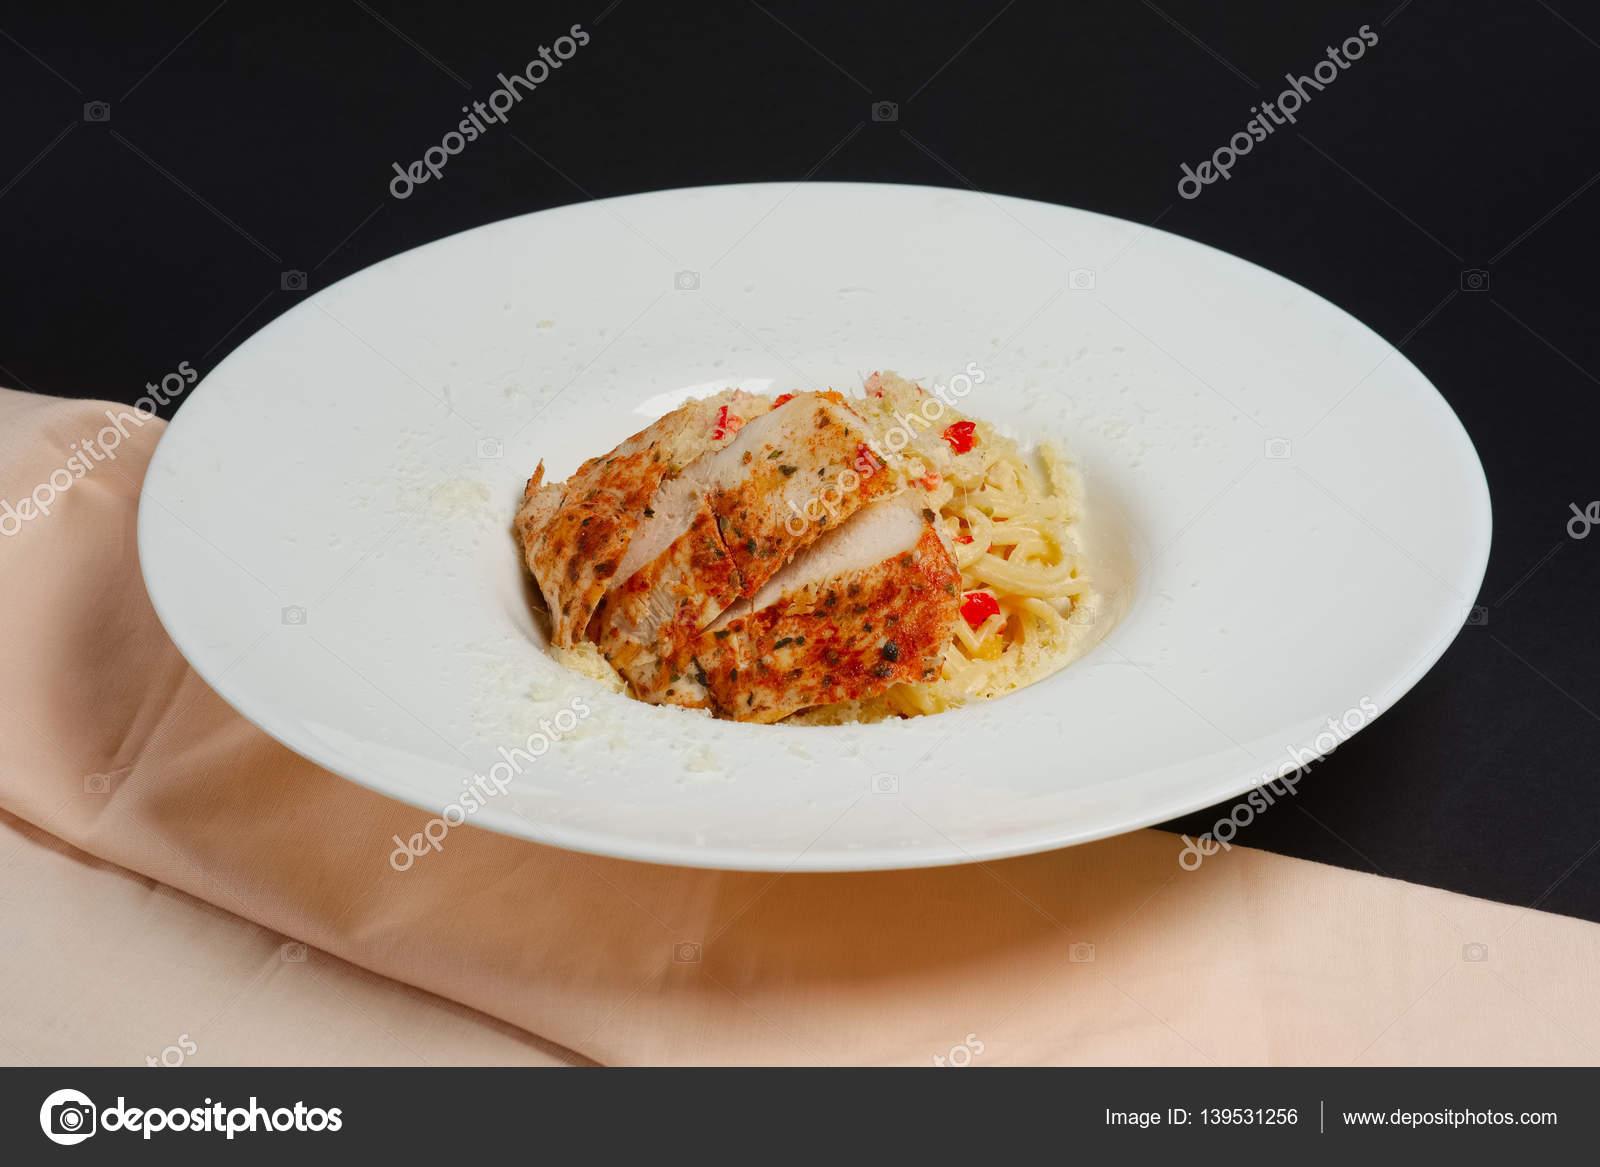 Platte mit Pasta, Käse und Hähnchen Filet — Stockfoto © boomeart ...